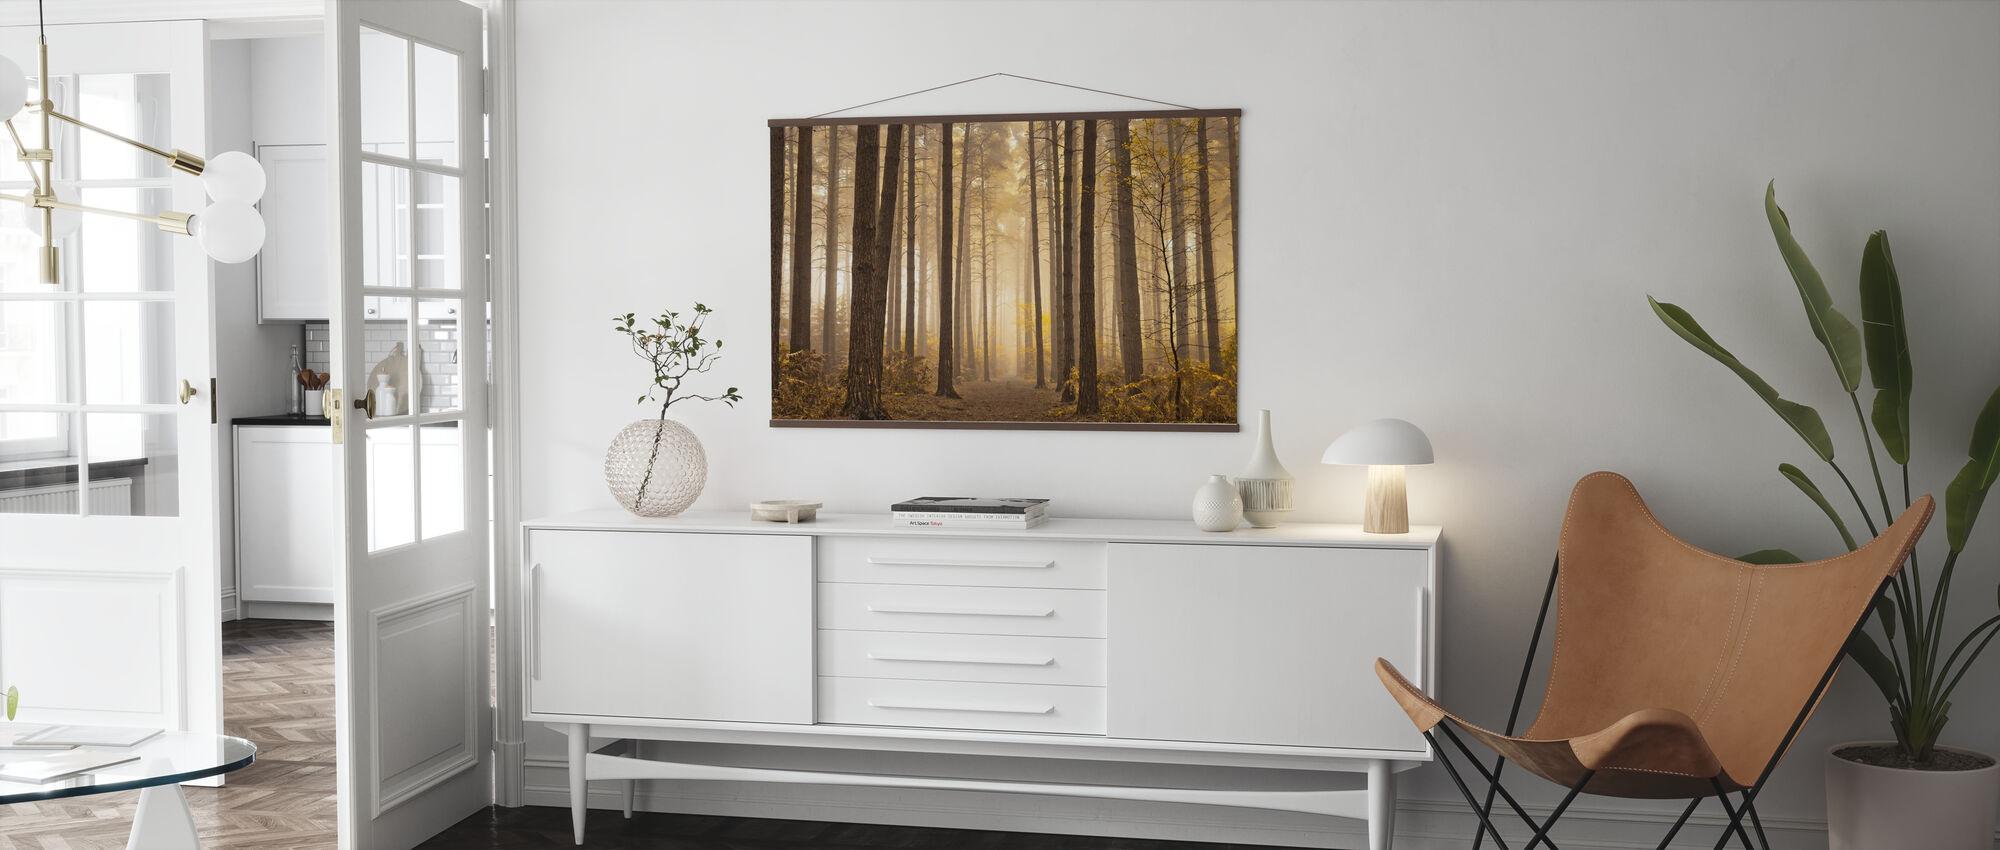 Misty Trees - Poster - Living Room